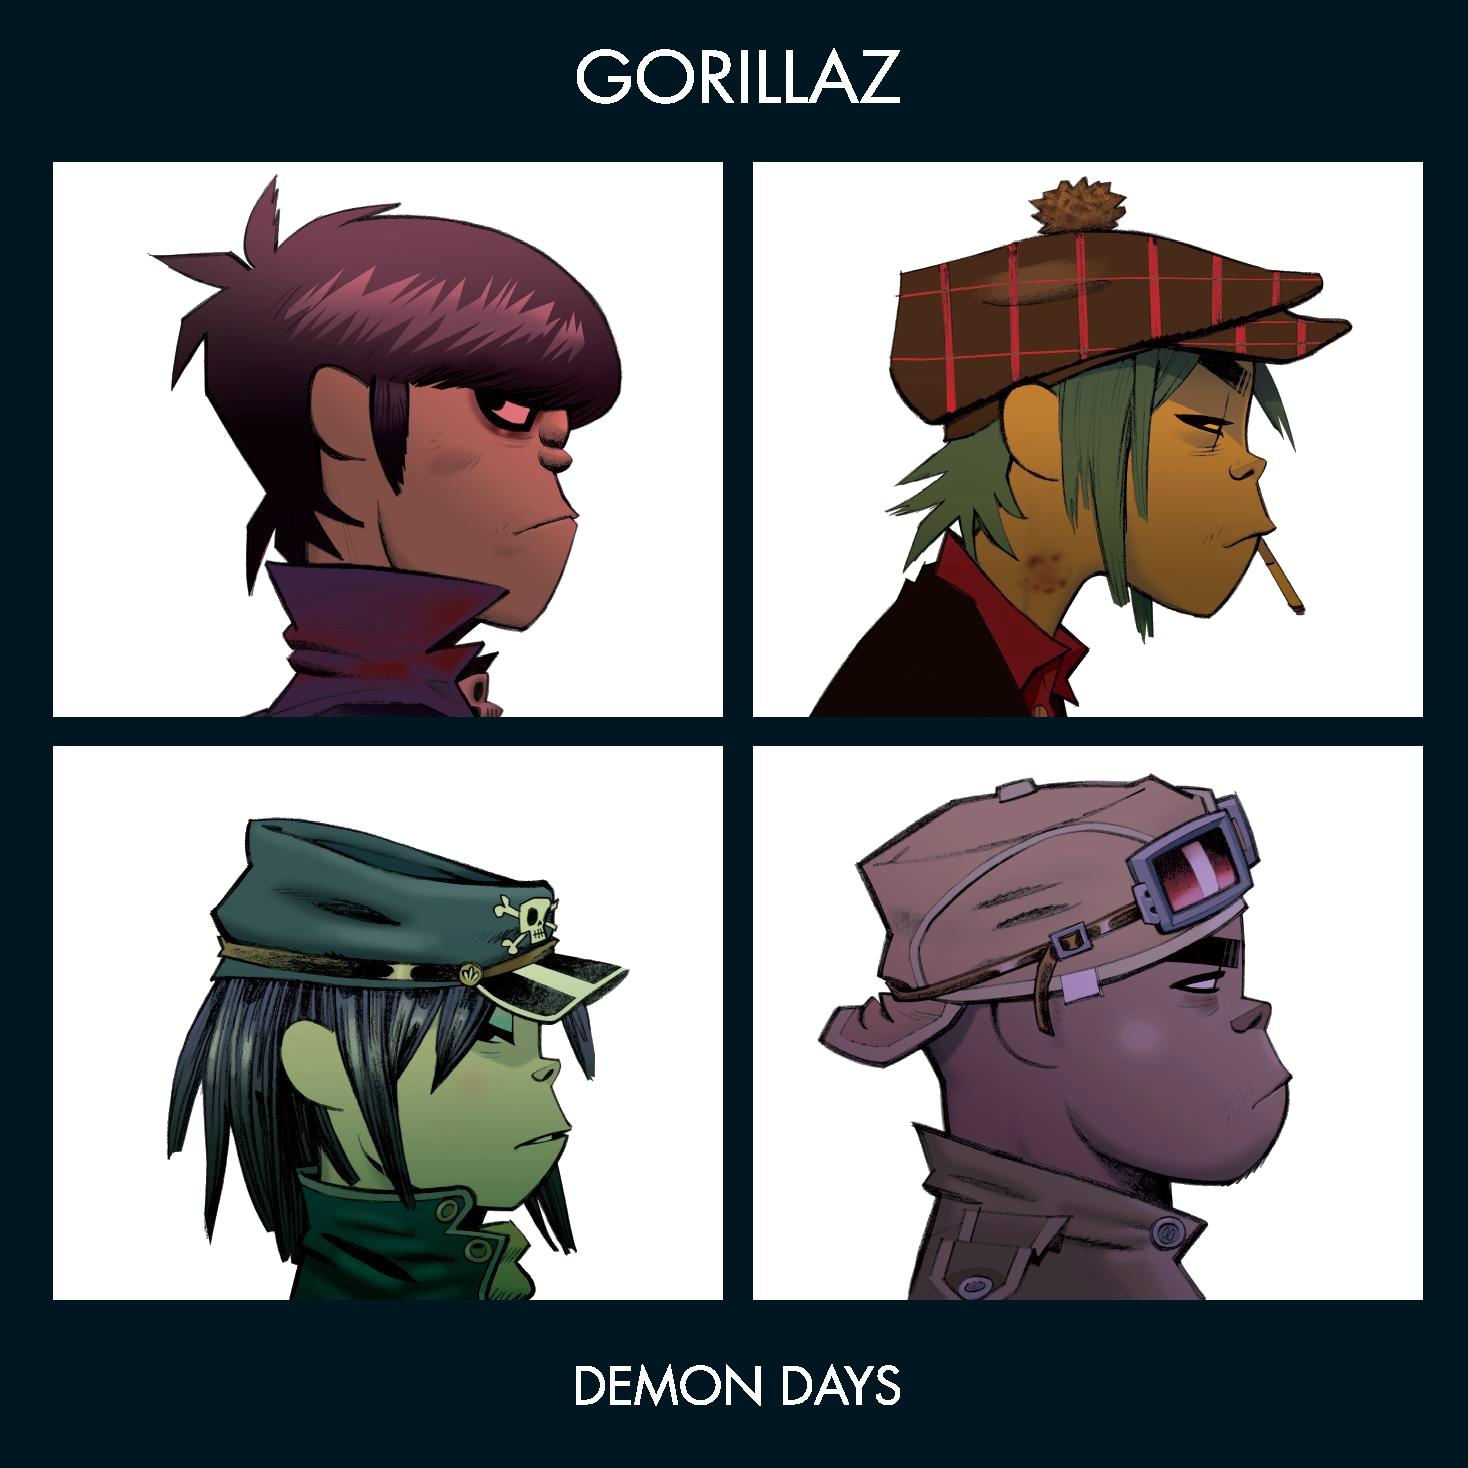 Y Gorillaz Demon Days | Go...